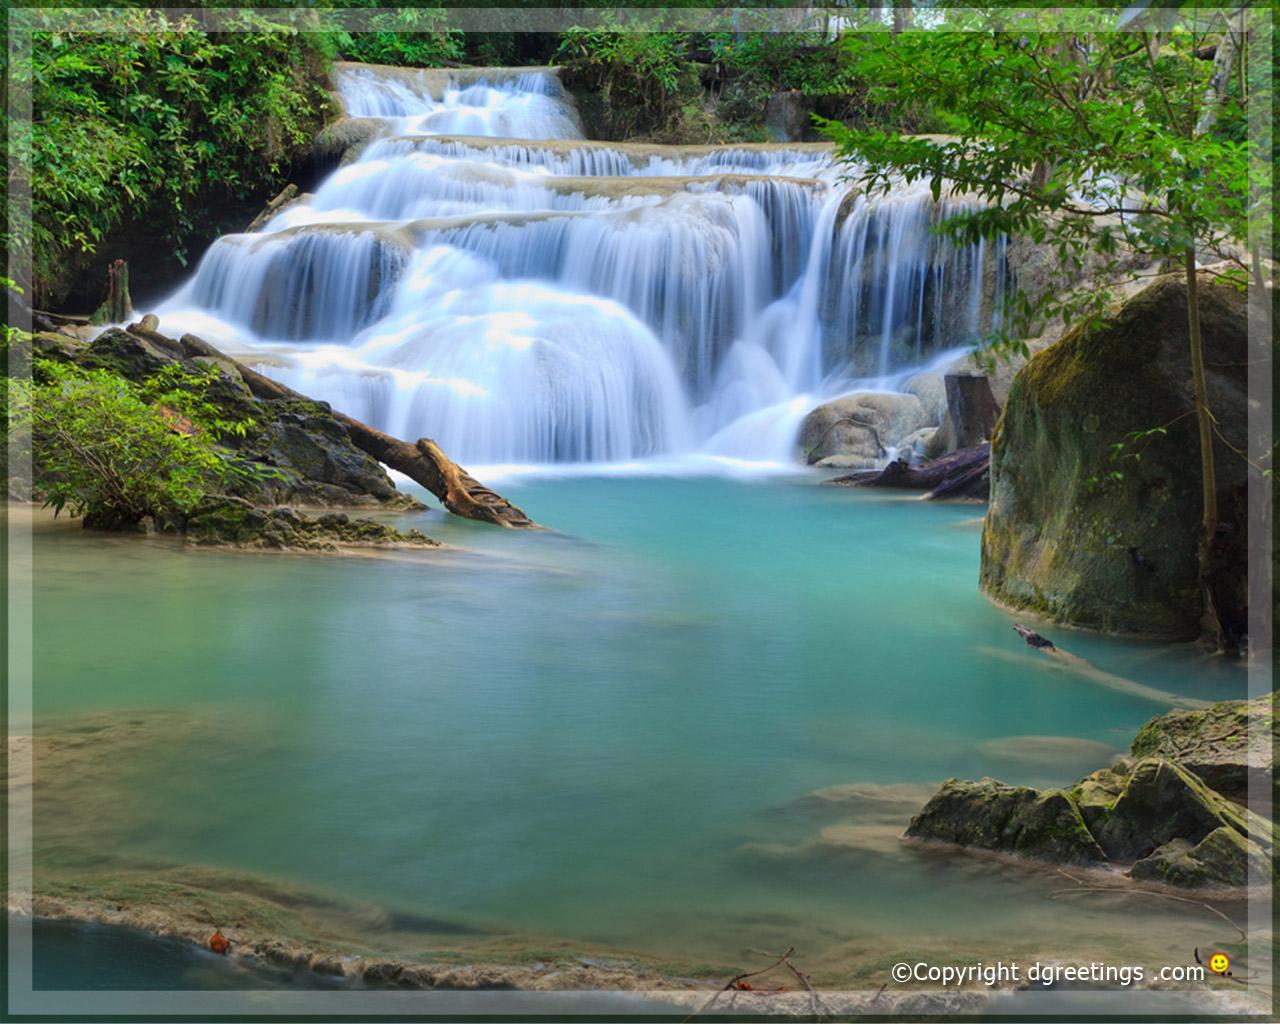 [49+] Moving Waterfall Desktop Wallpaper On WallpaperSafari